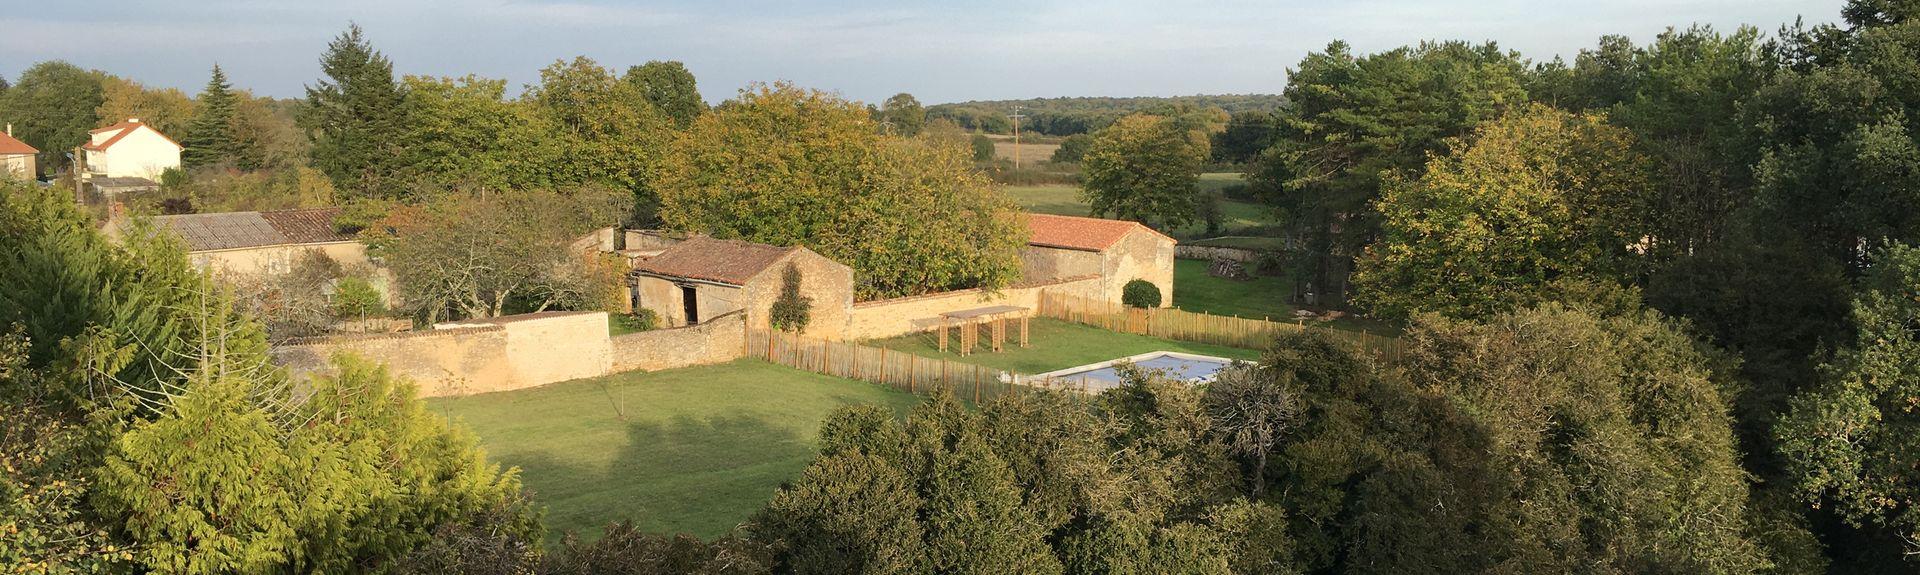 Saint-Martin-la-Pallu, Aquitaine-Limousin-Poitou-Charentes, Frankrike